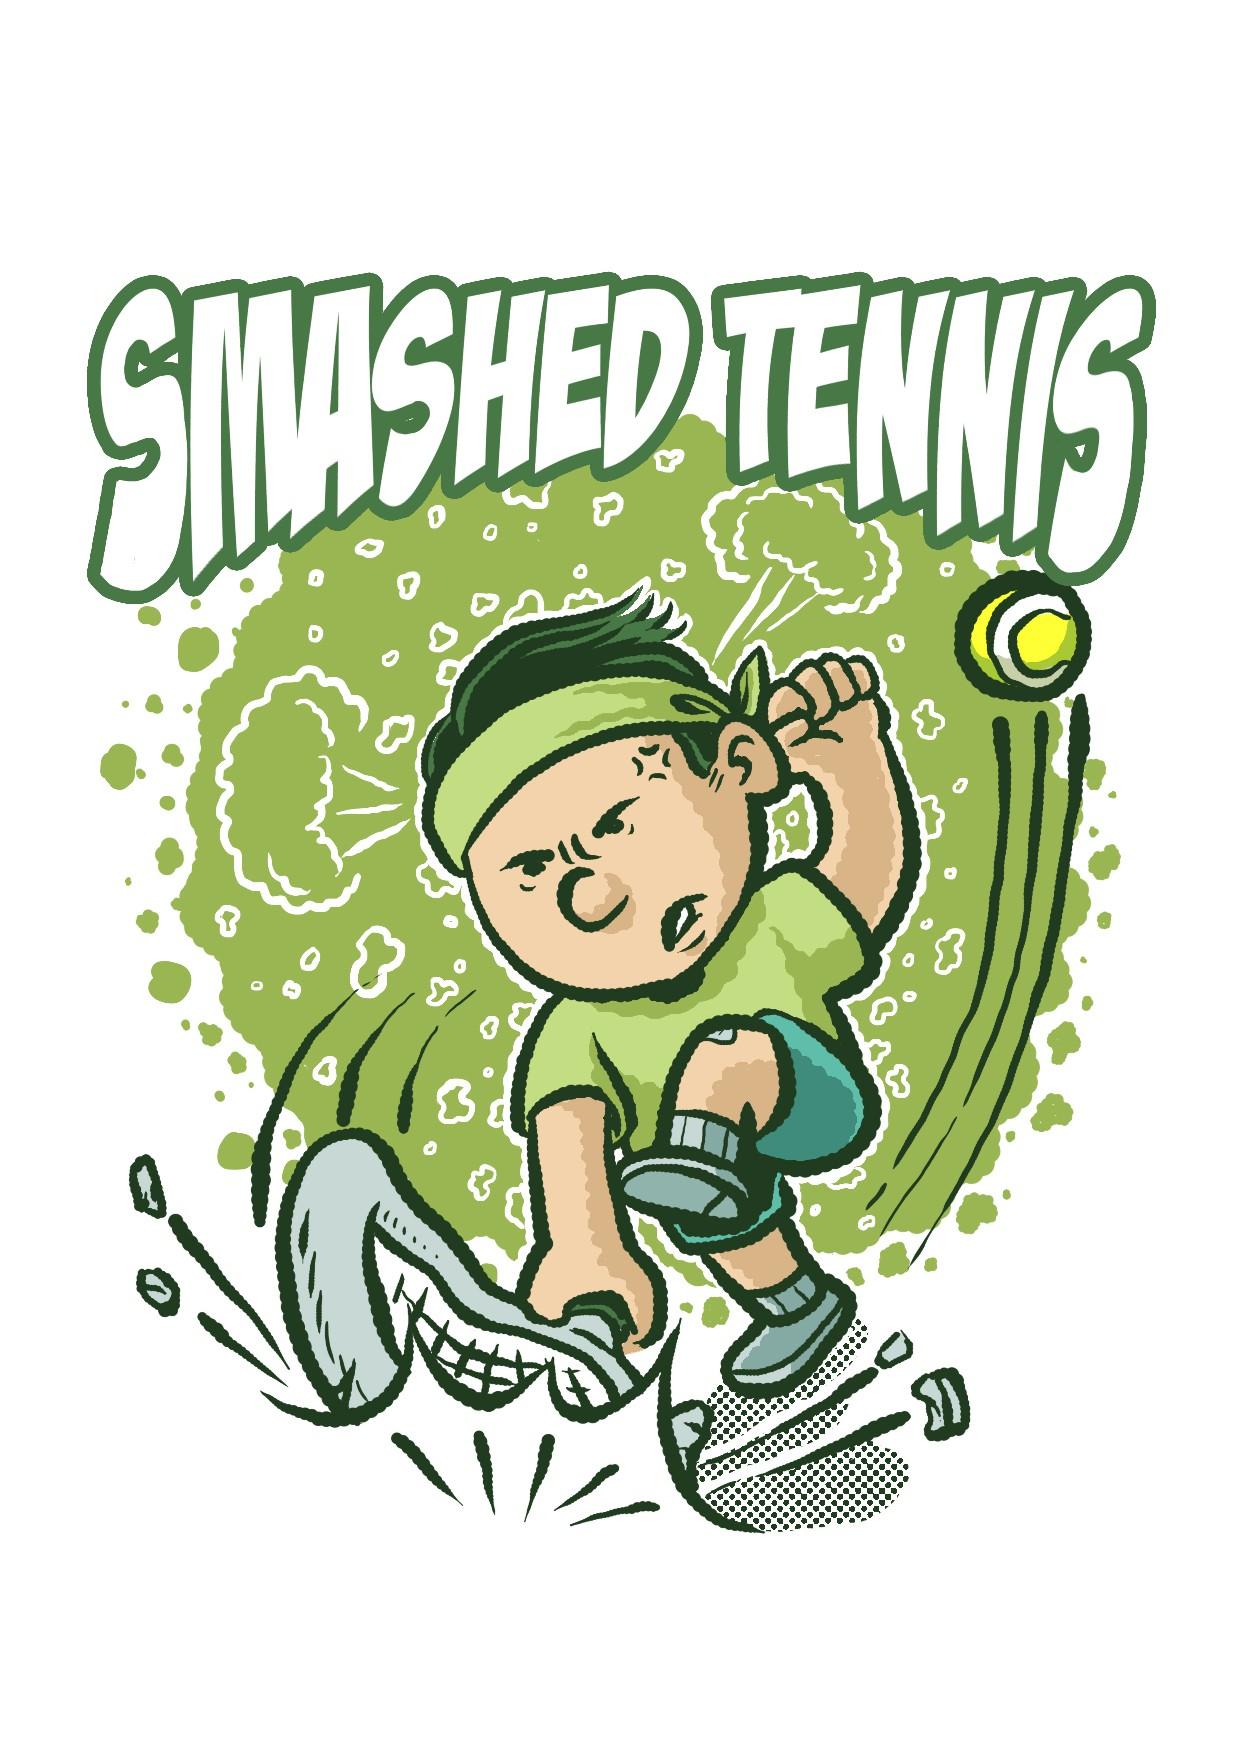 Cool Kid Cartoon Tennis Player Character